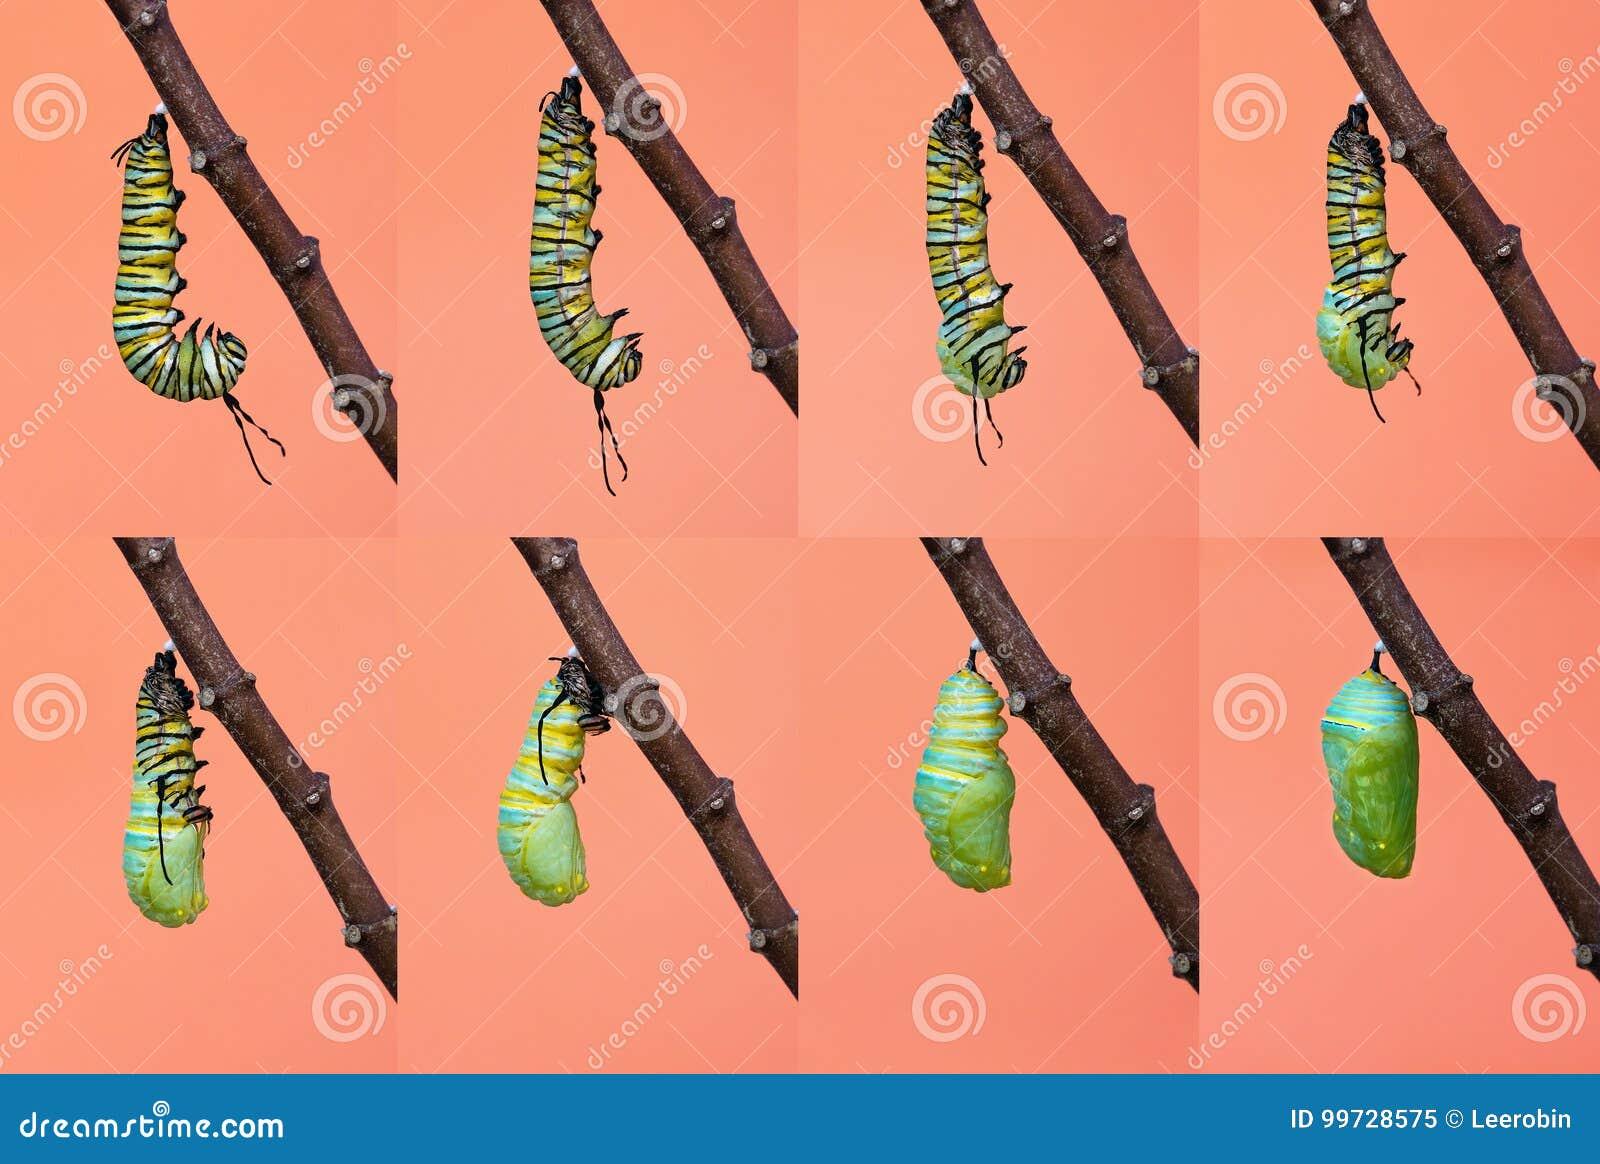 Metamorfosis de la mariposa de monarca de la oruga a la crisálida